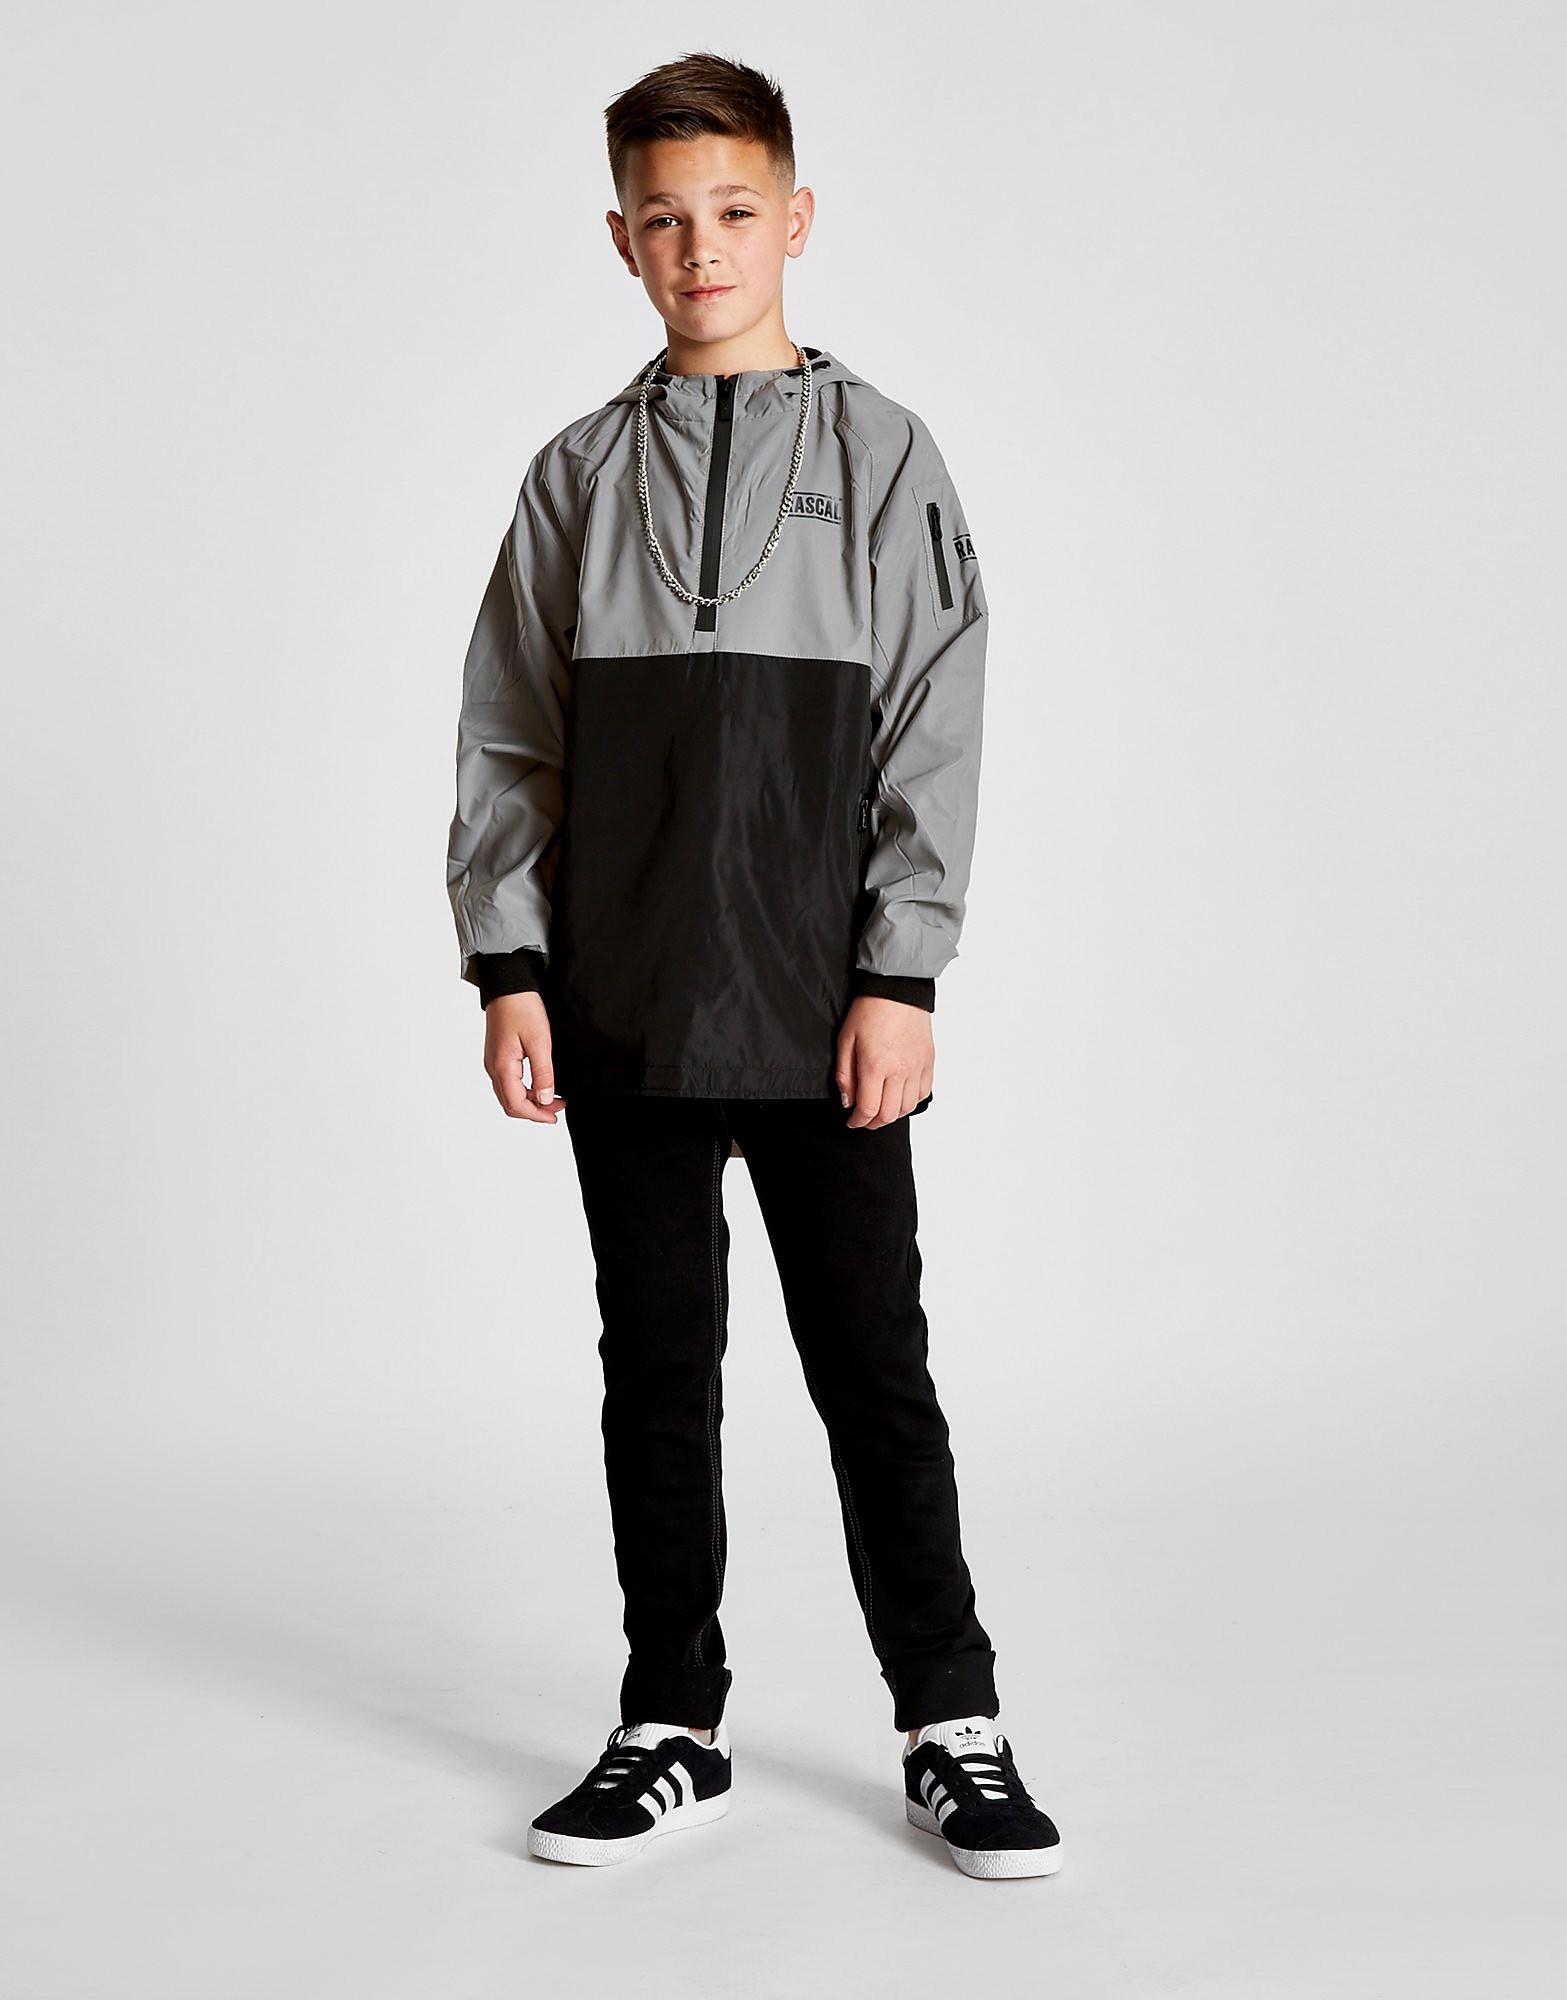 Rascal Reflective Overhead Jacket Junior